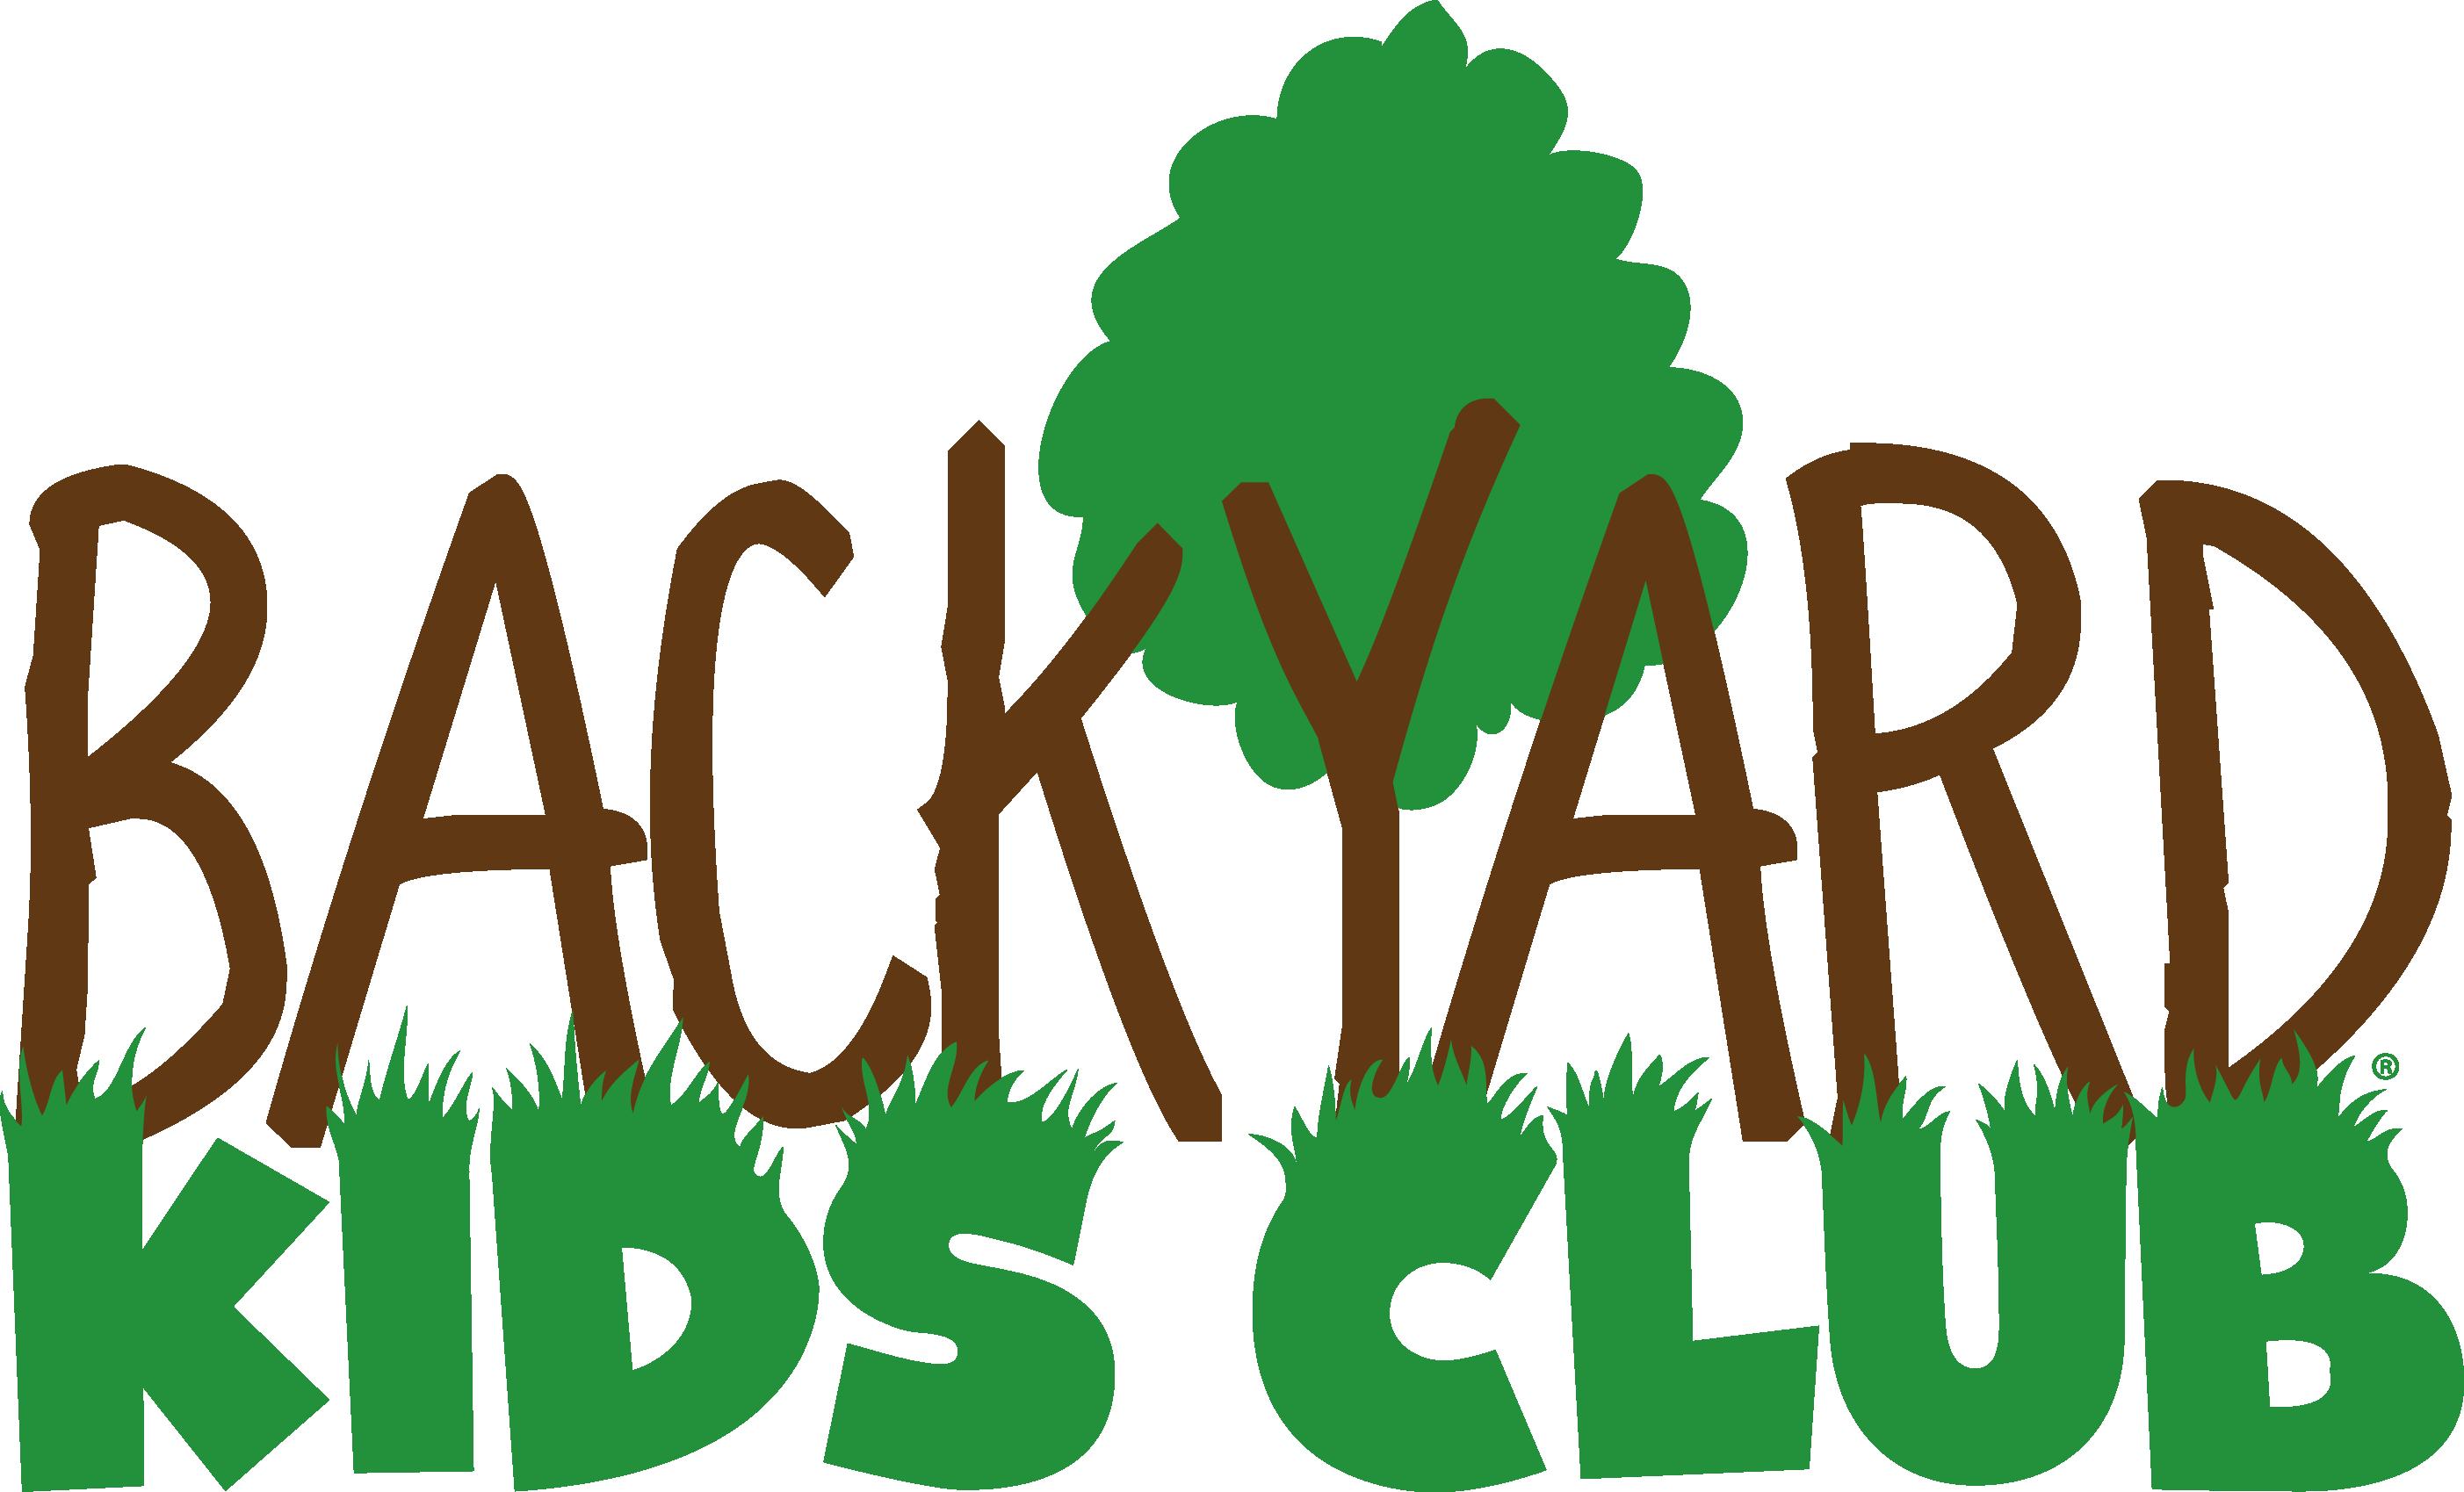 backyard clip art free clipart panda free clipart images rh clipartpanda com Youth Ministry Backgrounds Youth Ministry Backgrounds